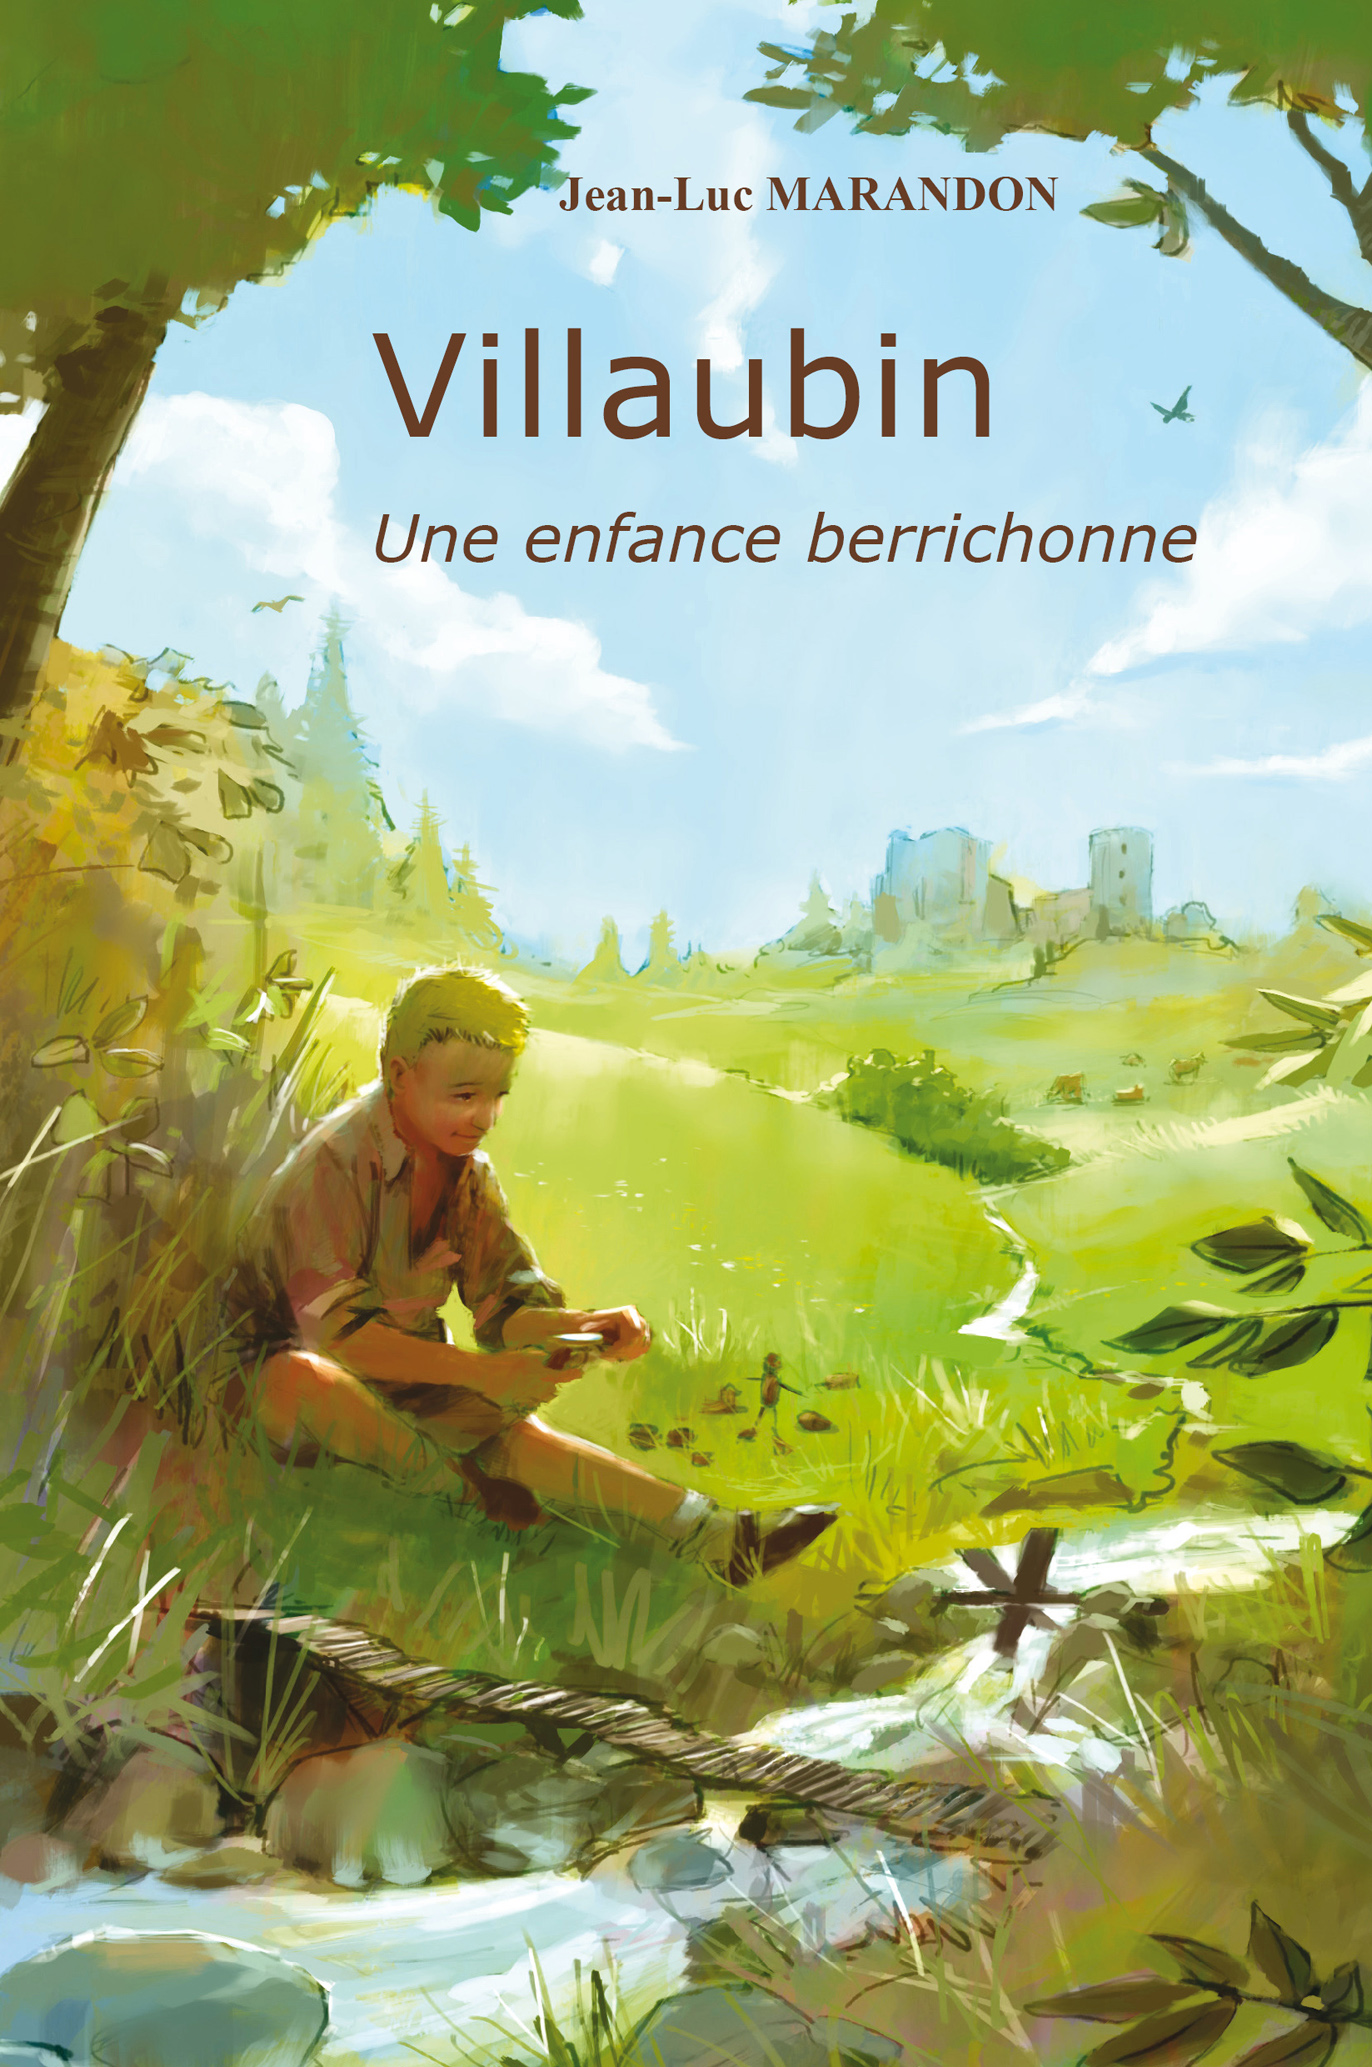 Villaubin, une enfance berrichonne